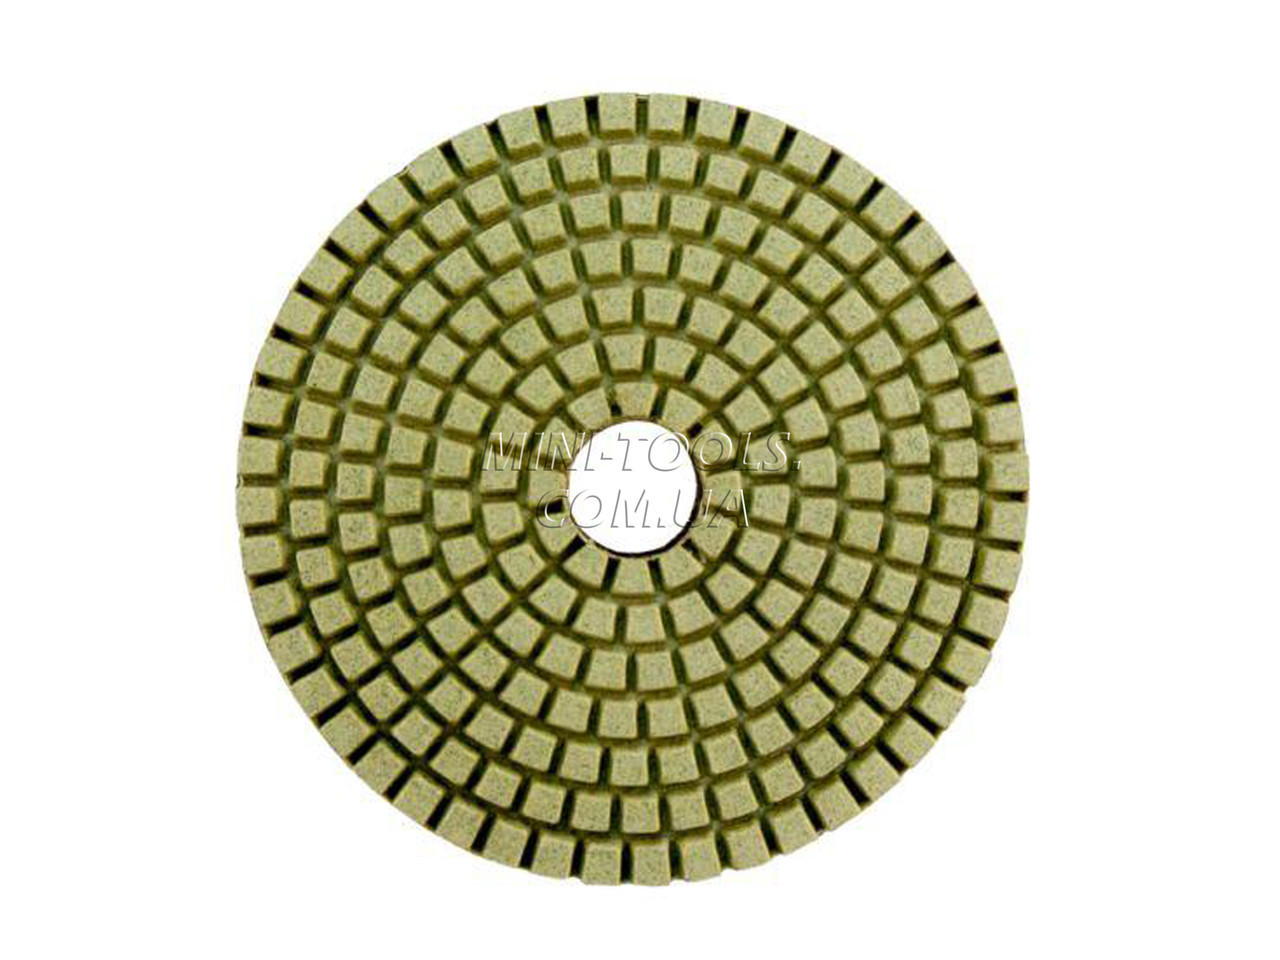 Черепашка D-100мм. зерно #80. Алмазний гнучкий шліфувальний круг YDS Tools